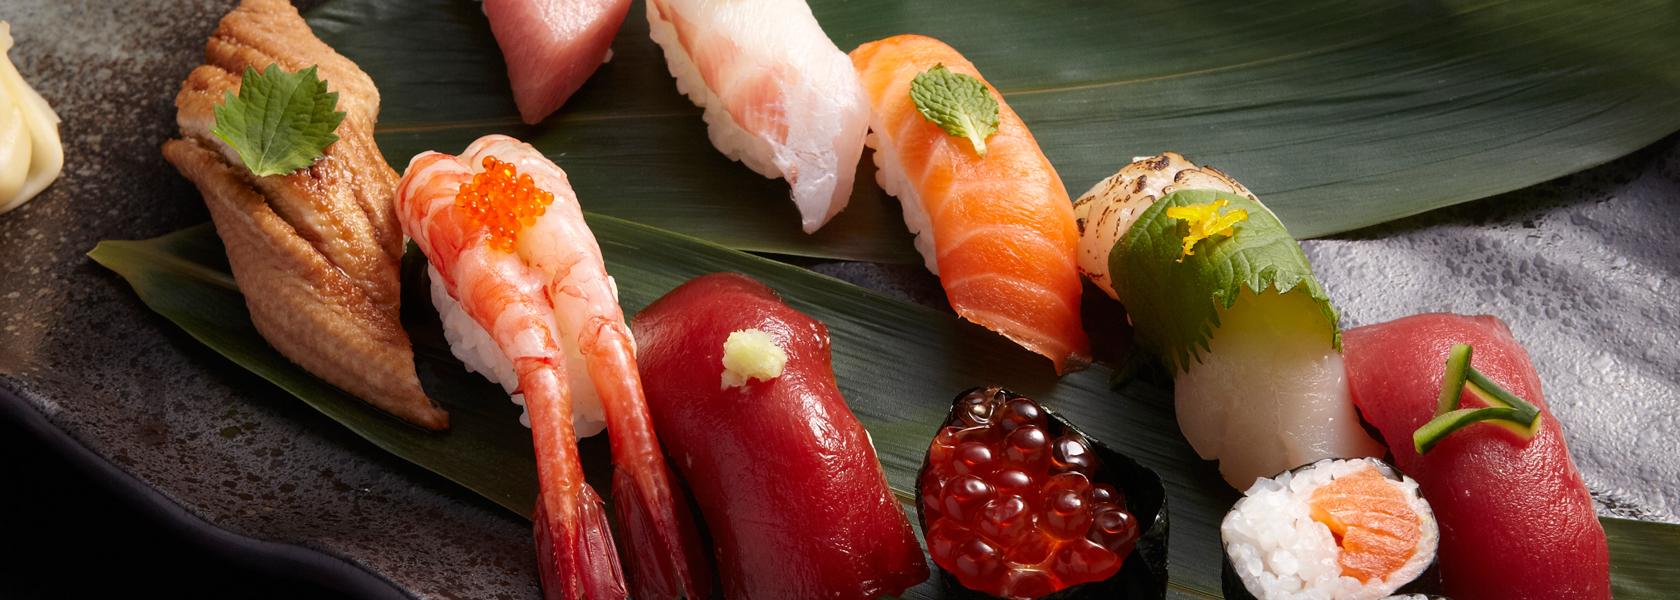 ichiro sushi bar top